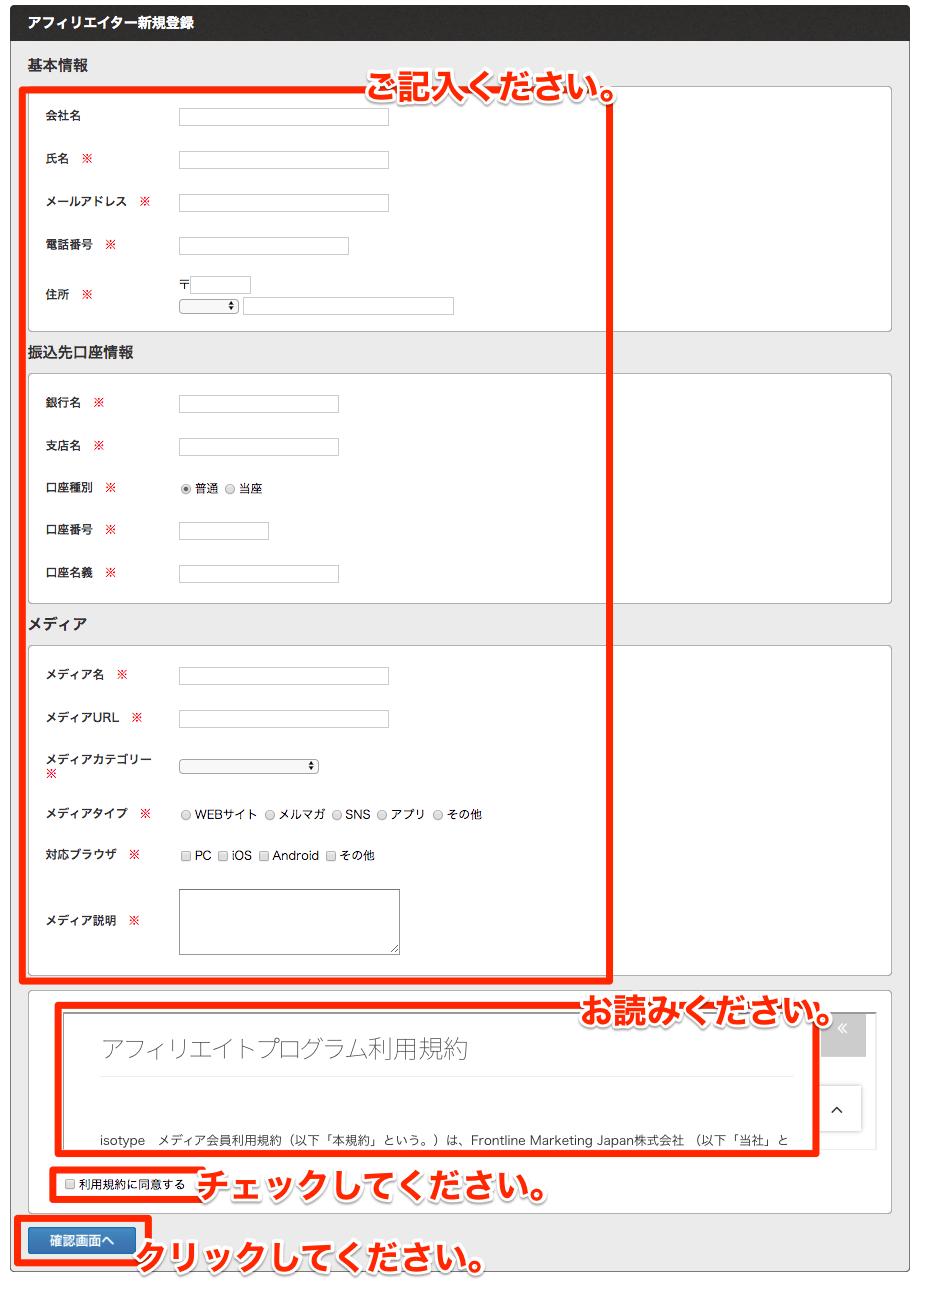 isotypeアフィリエイトプログラム